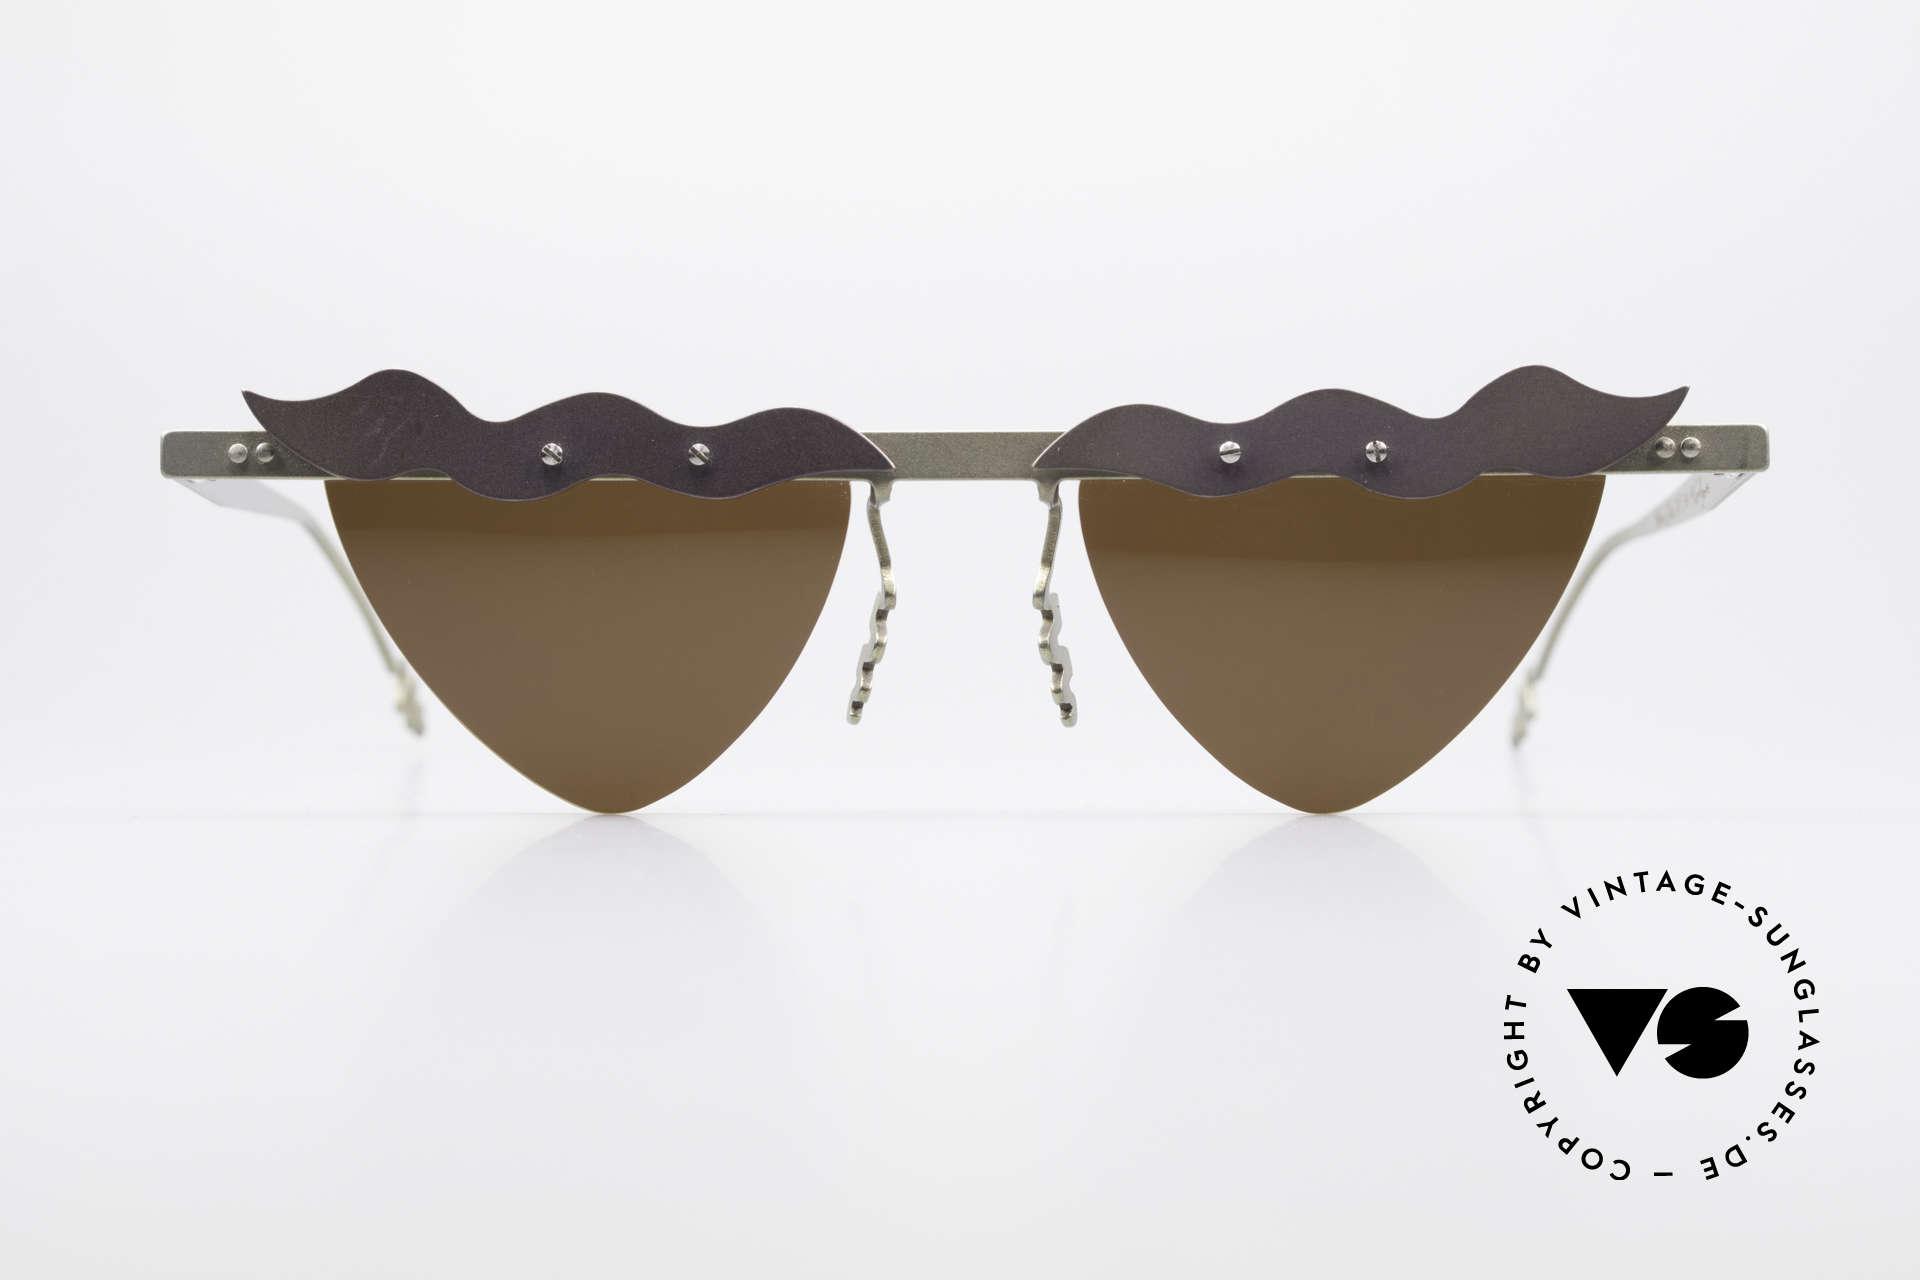 Theo Belgium Tita II C10 Heart Shaped Sun Lenses, founded in 1989 as 'anti mainstream' eyewear / glasses, Made for Women